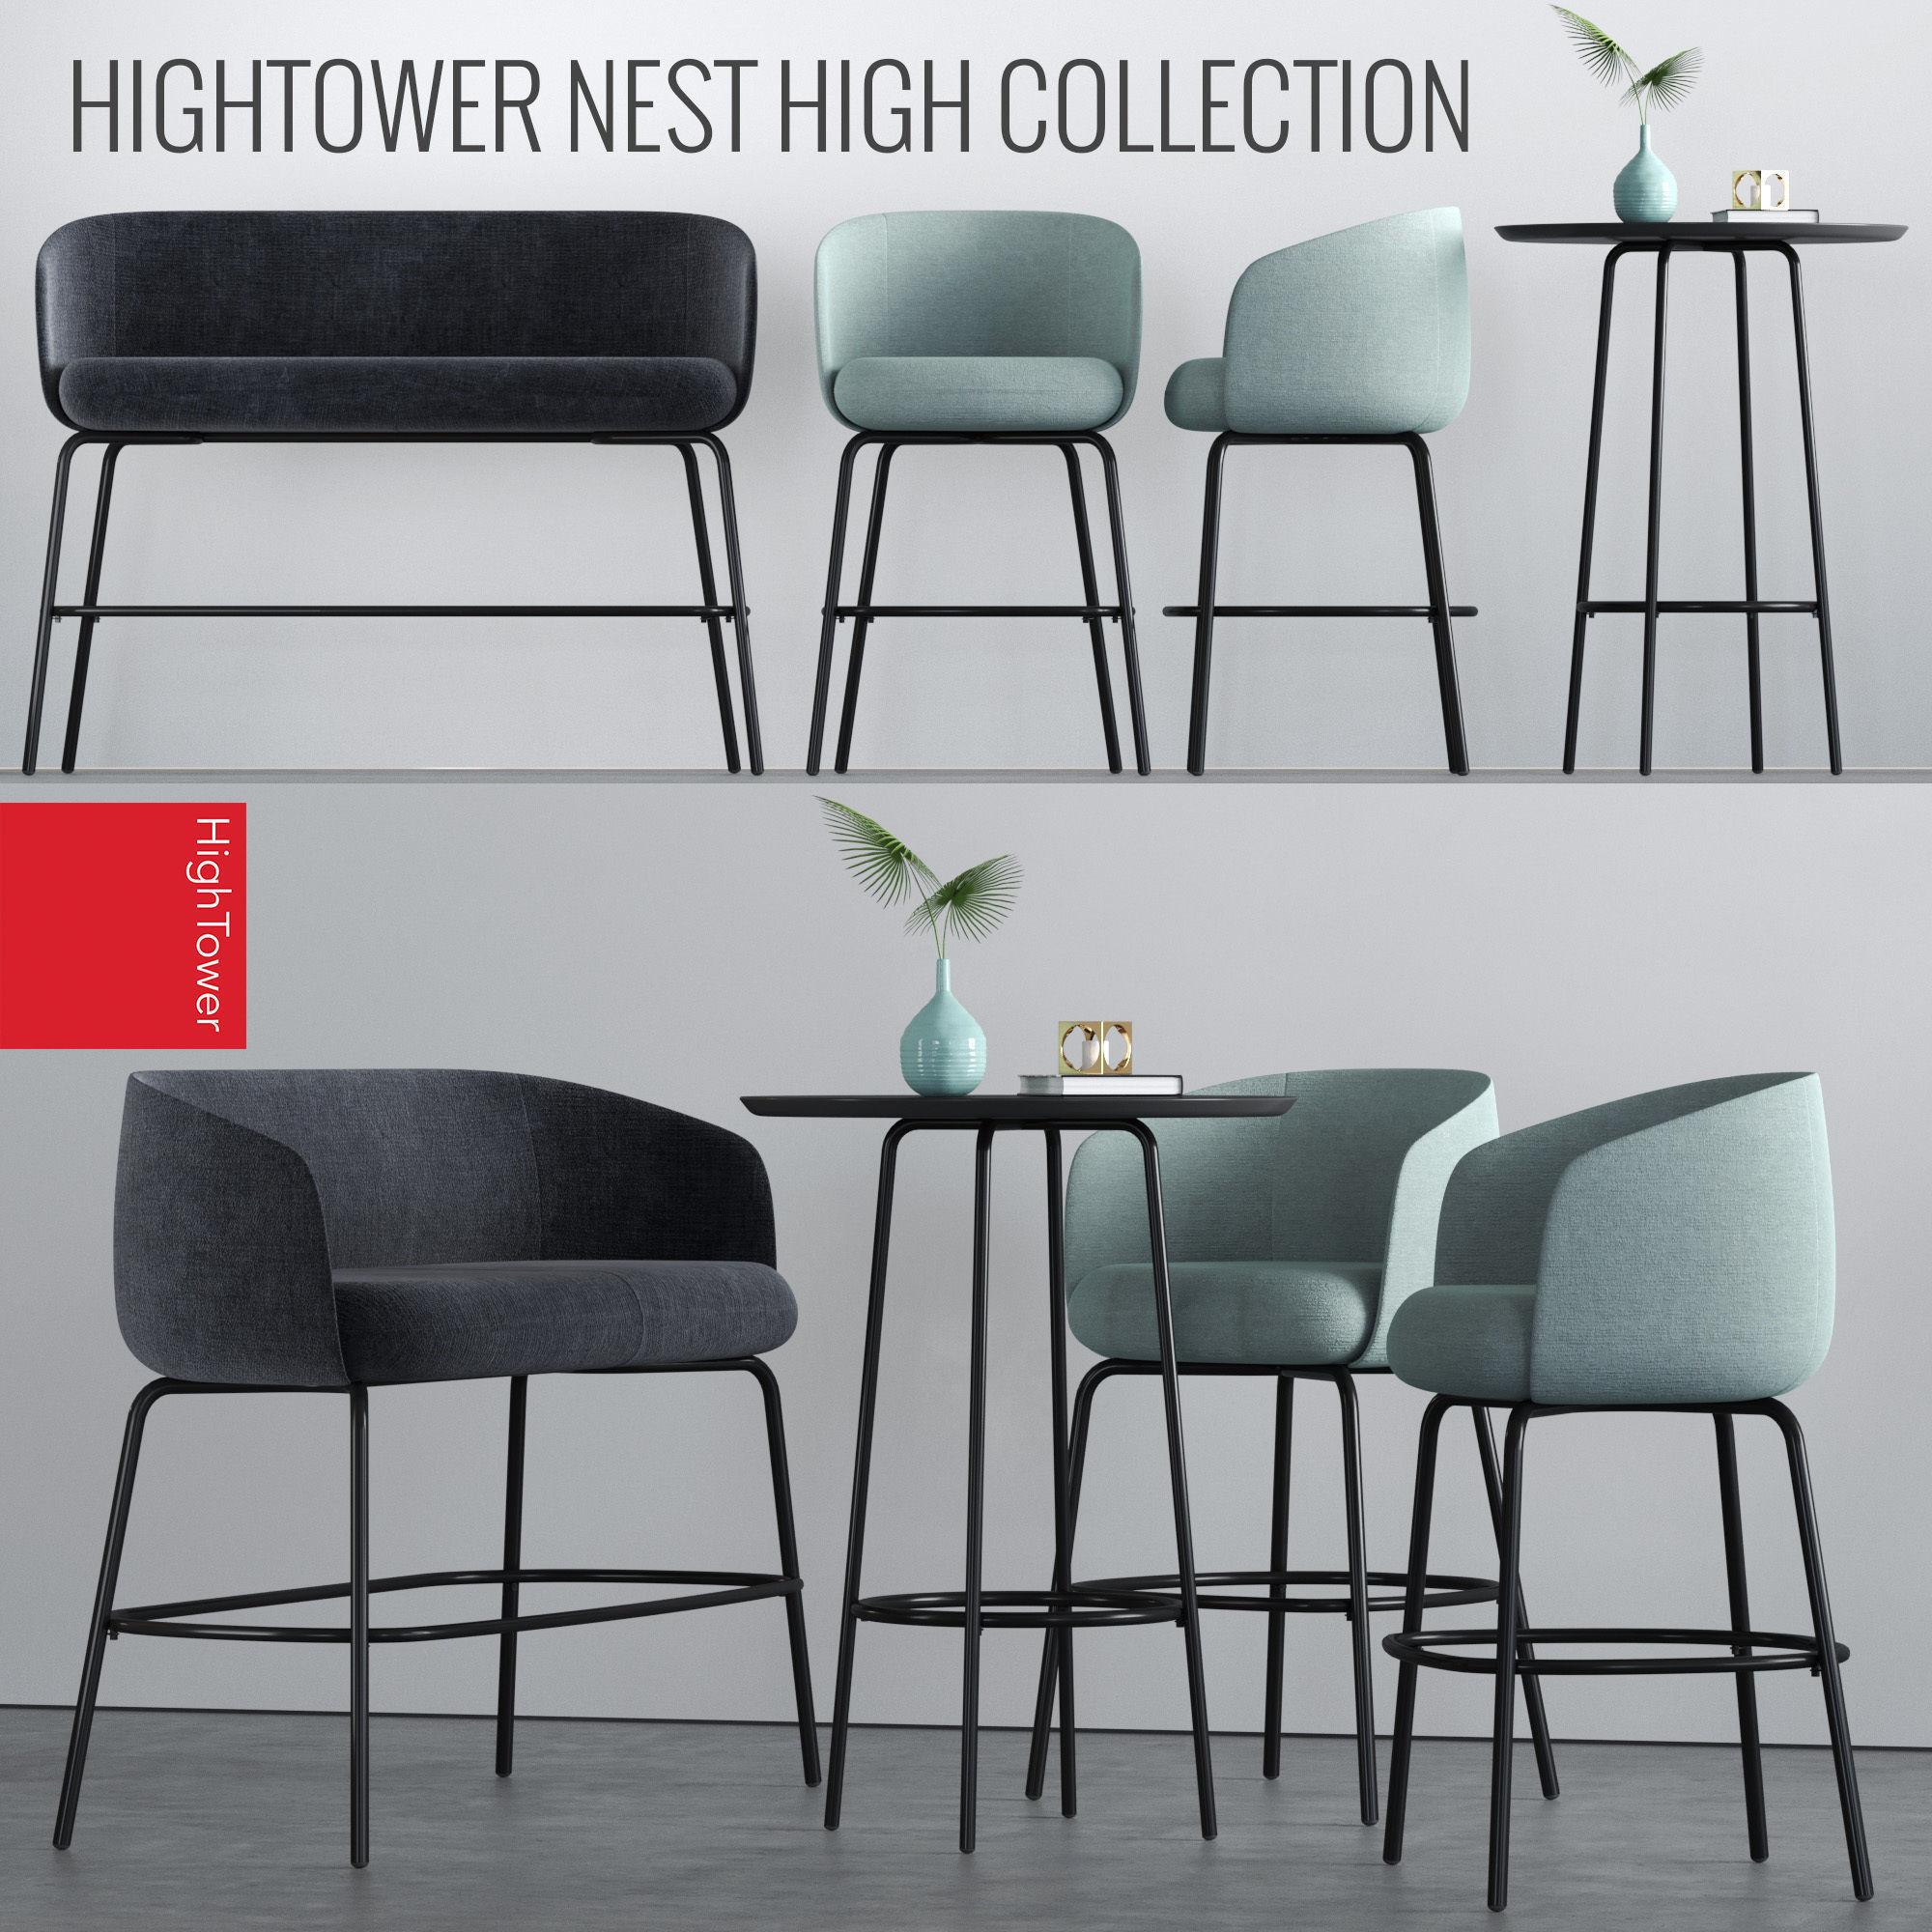 3d Model Hightower High Nest Set Cgtrader